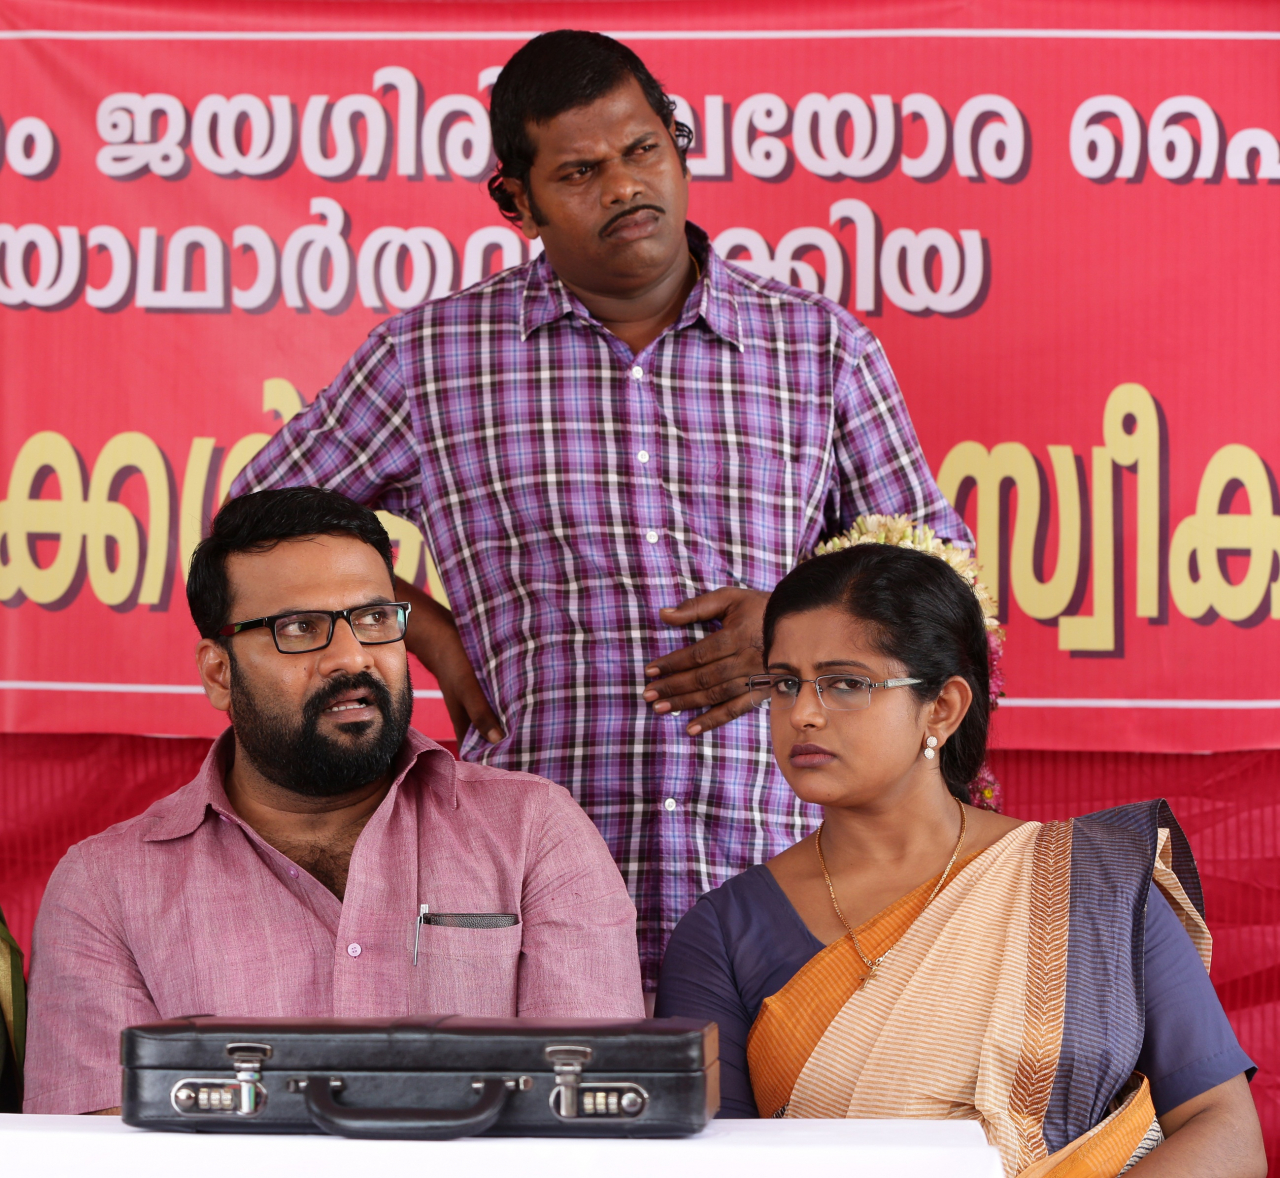 Veena Nair Tv Anchor: Tini Tom ,Veena Nair And Shaju In Movie Vellimoonga Wallpaper